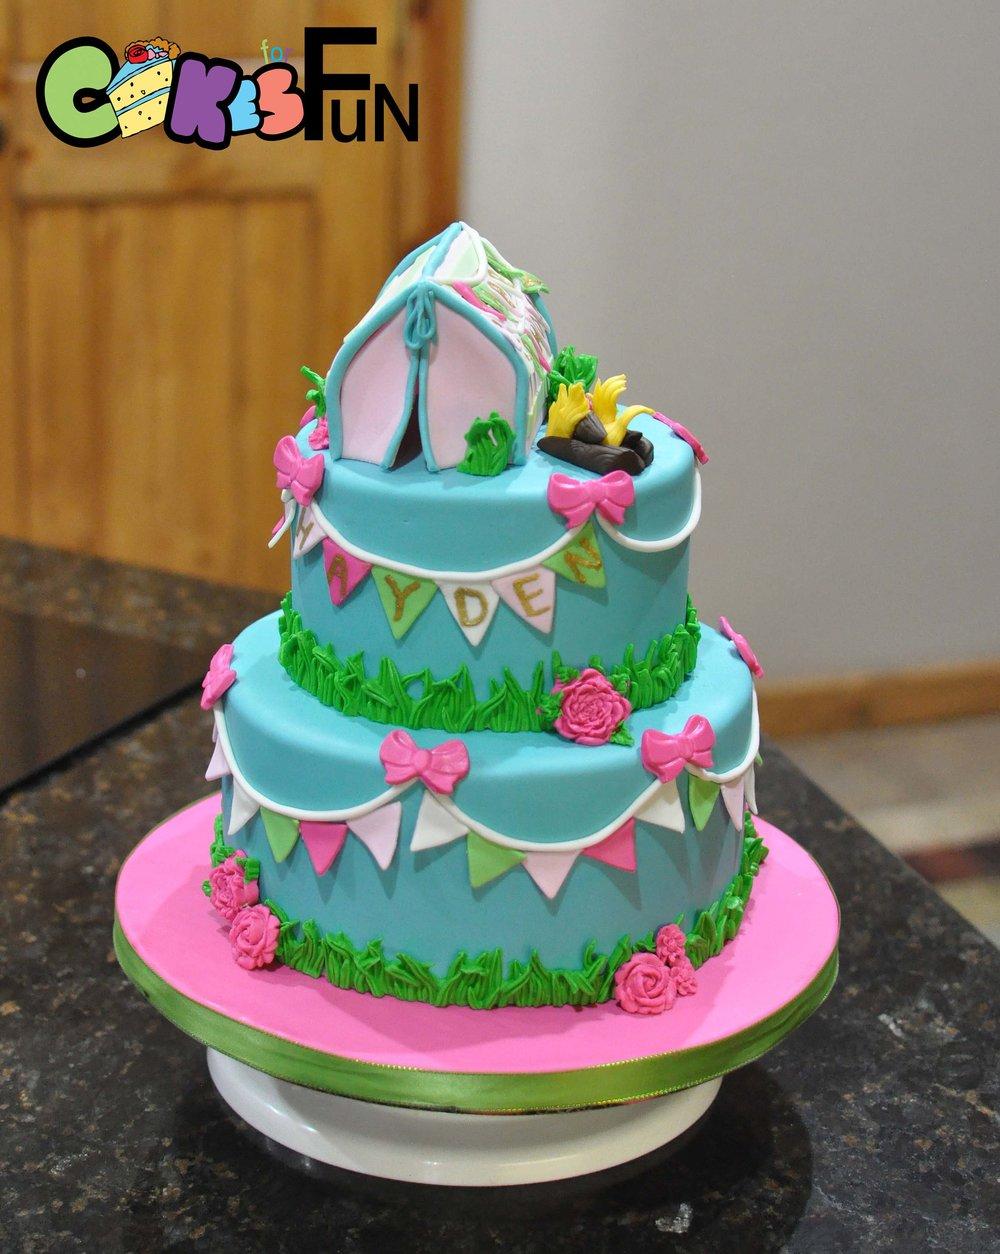 camping cake-marrs-05182018.jpg